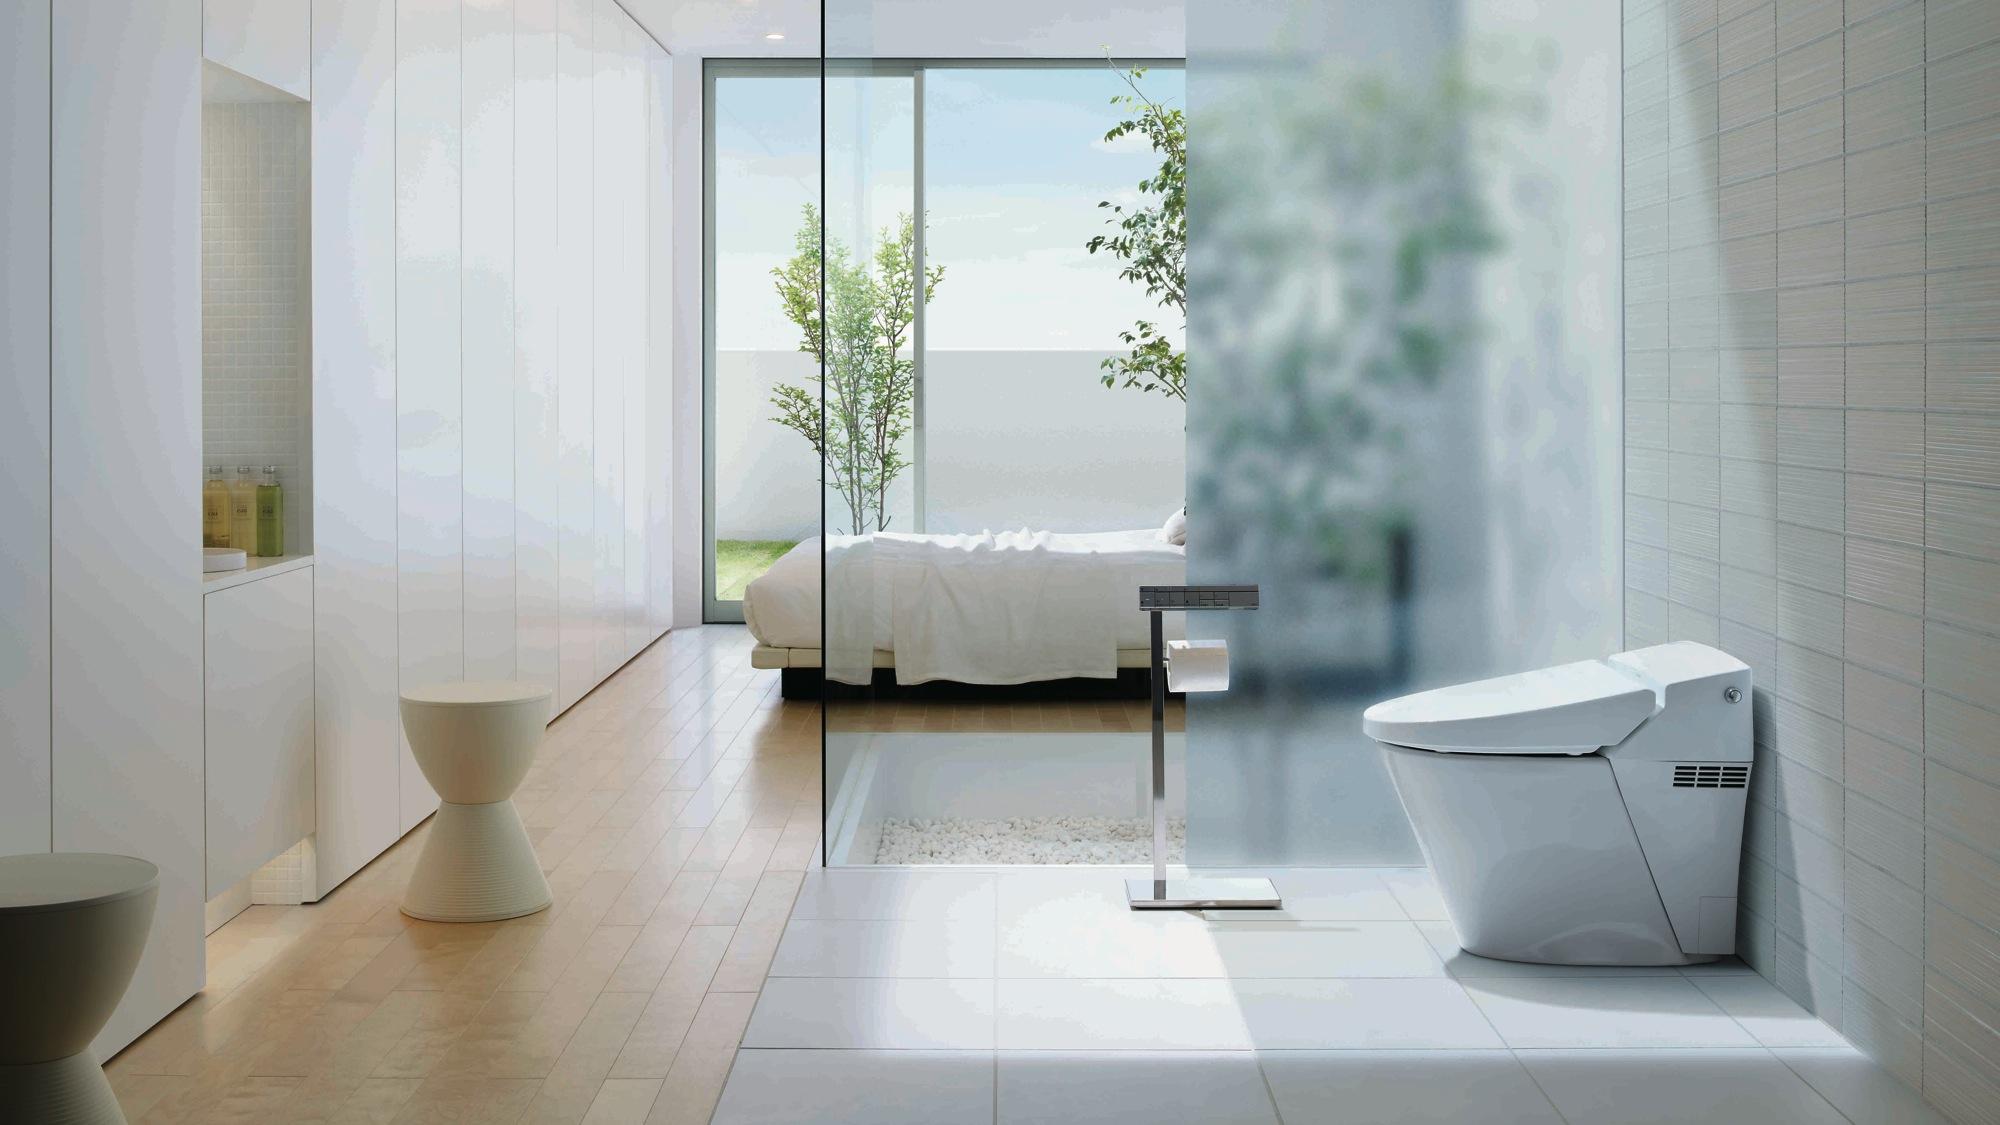 toilet-of-the-future-lixil